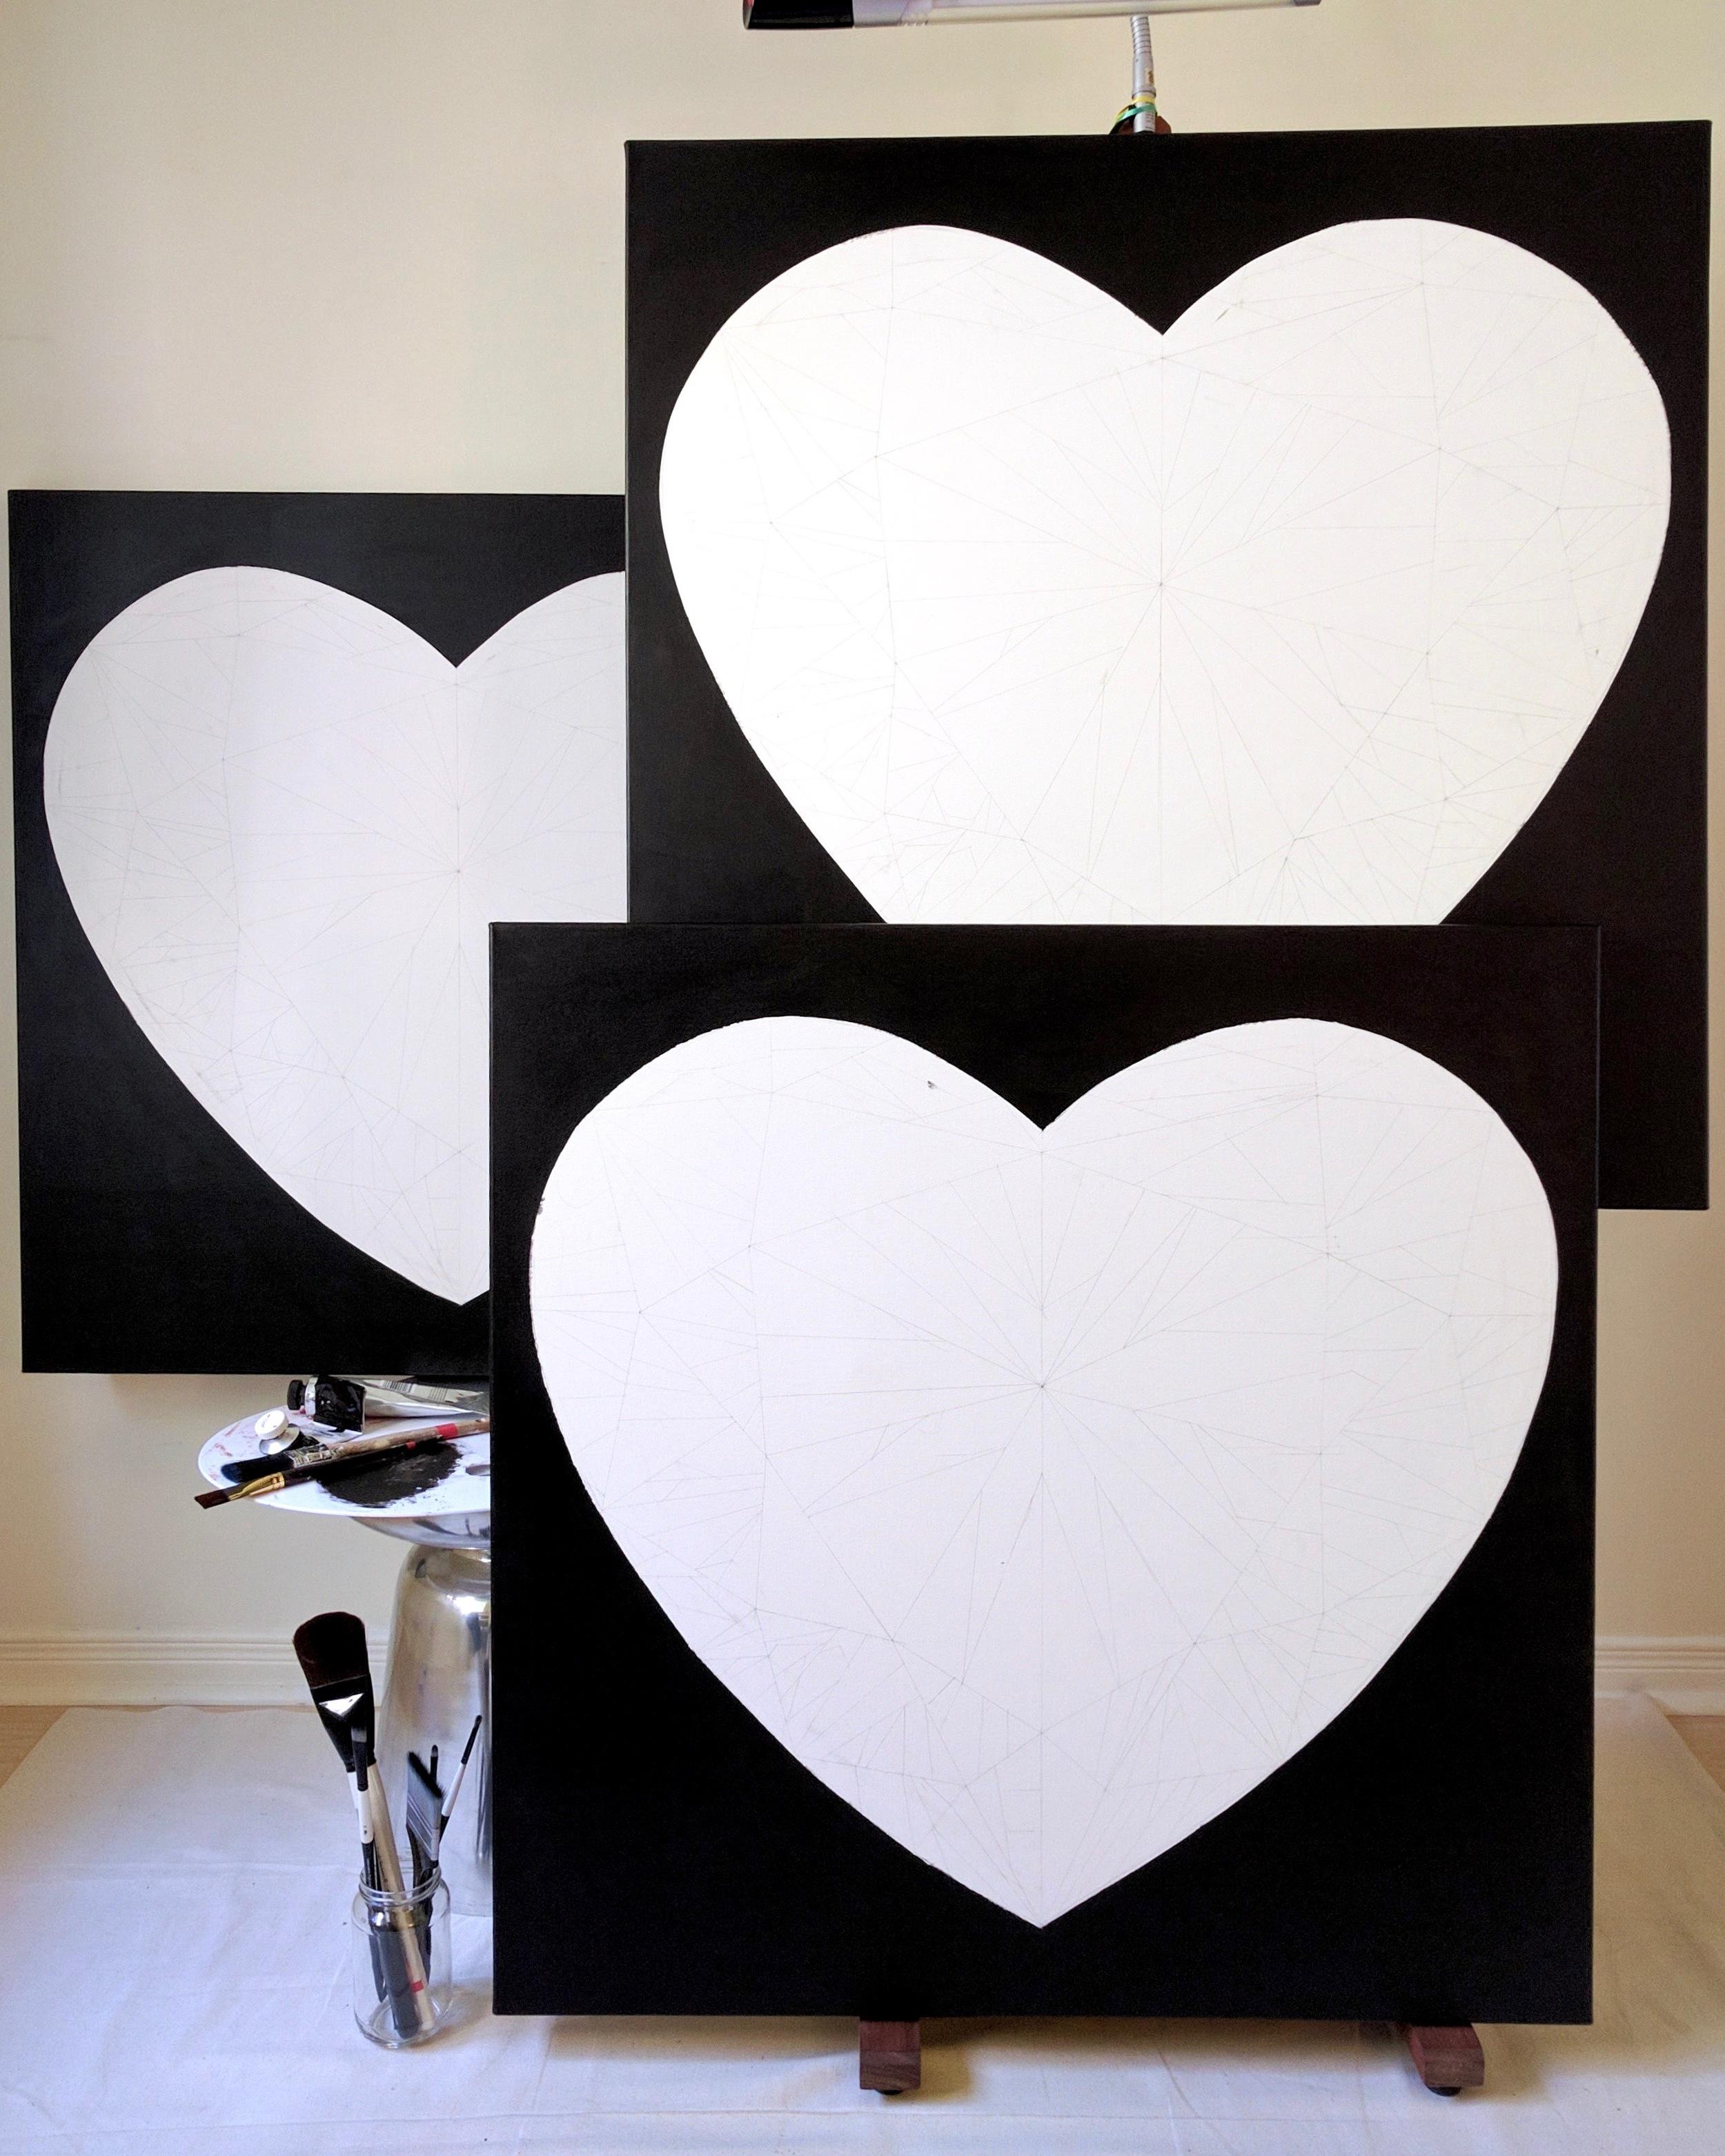 Trio of heart-shaped diamond paintings belong to the 'Diamond Portrait Series' by Reena Ahluwalia. 'Pure Heart' is one of the three heart-shaped diamond painting. ©Reena Ahluwalia